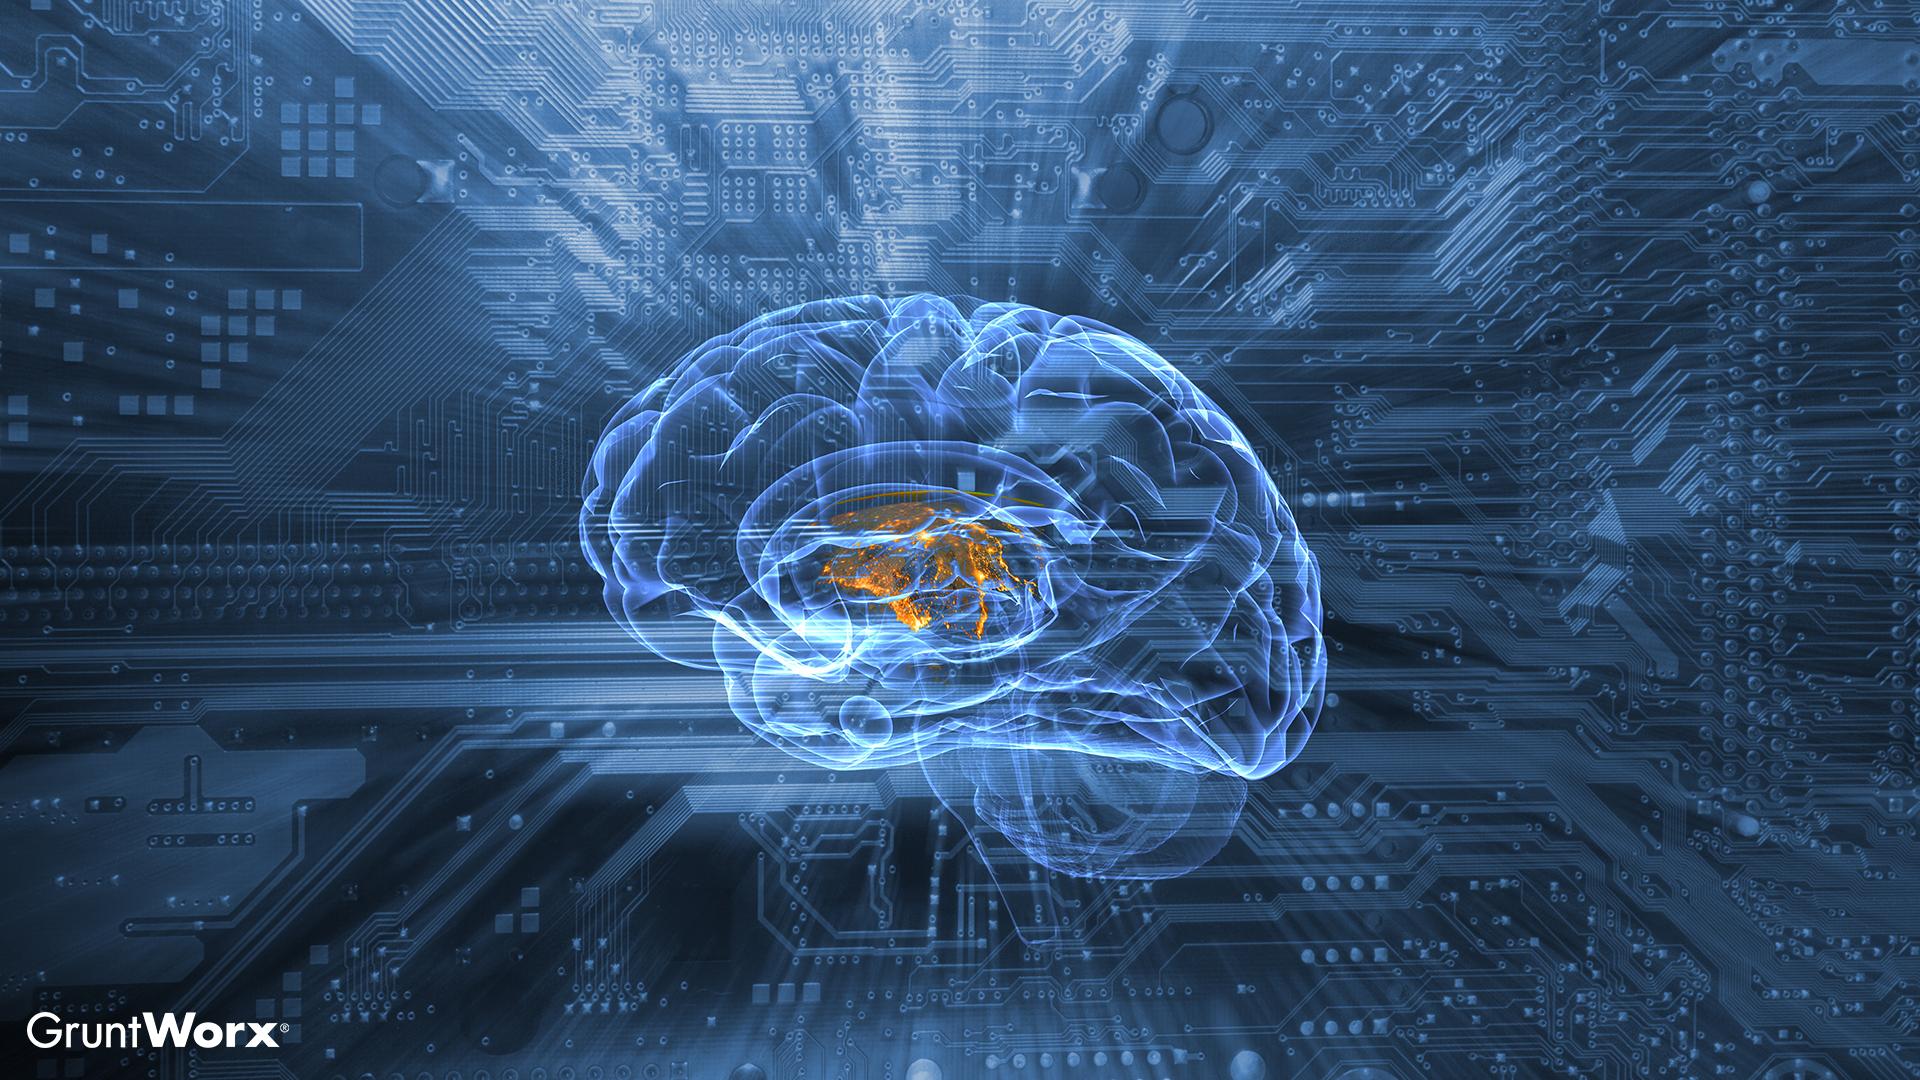 gwx-549-artificial-intelligence